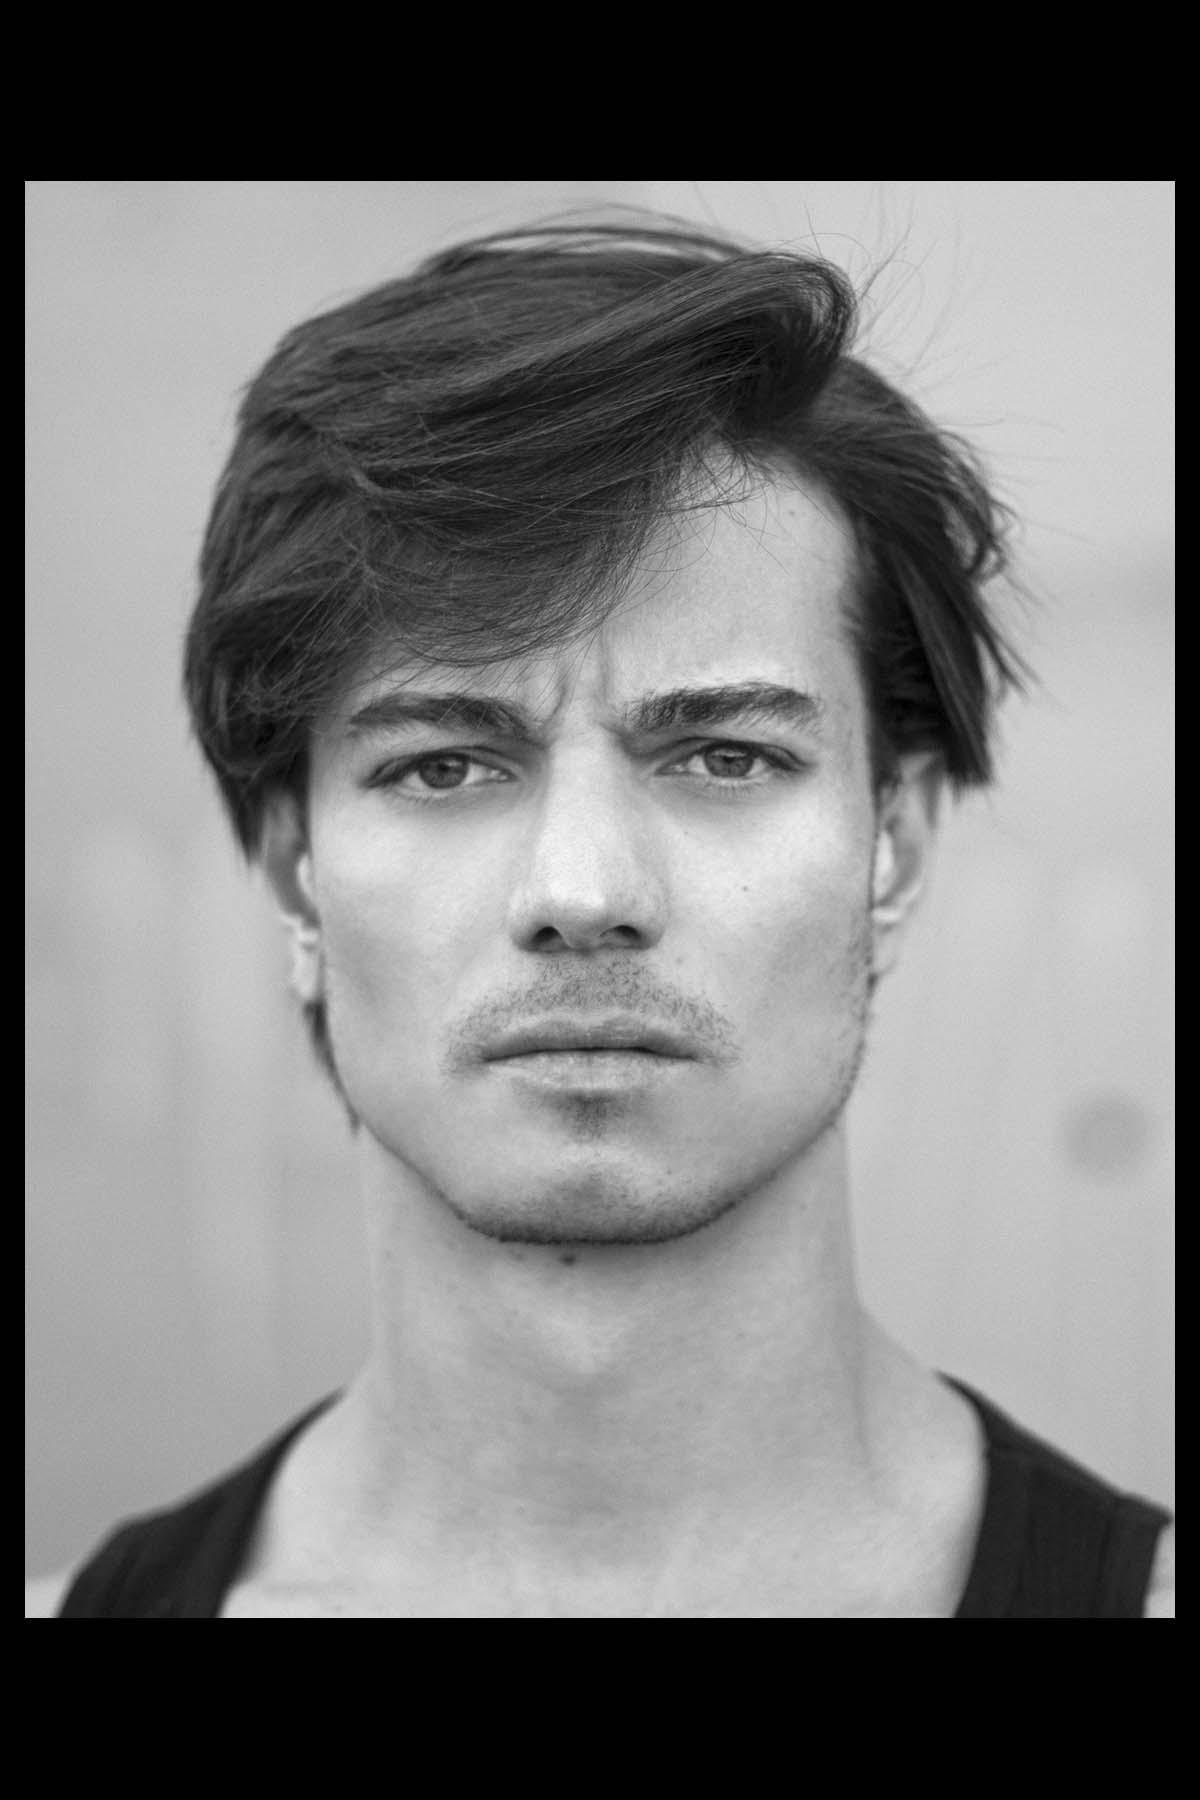 Sulevan Araujo by Filipe Galgani for Brazilian Male Model